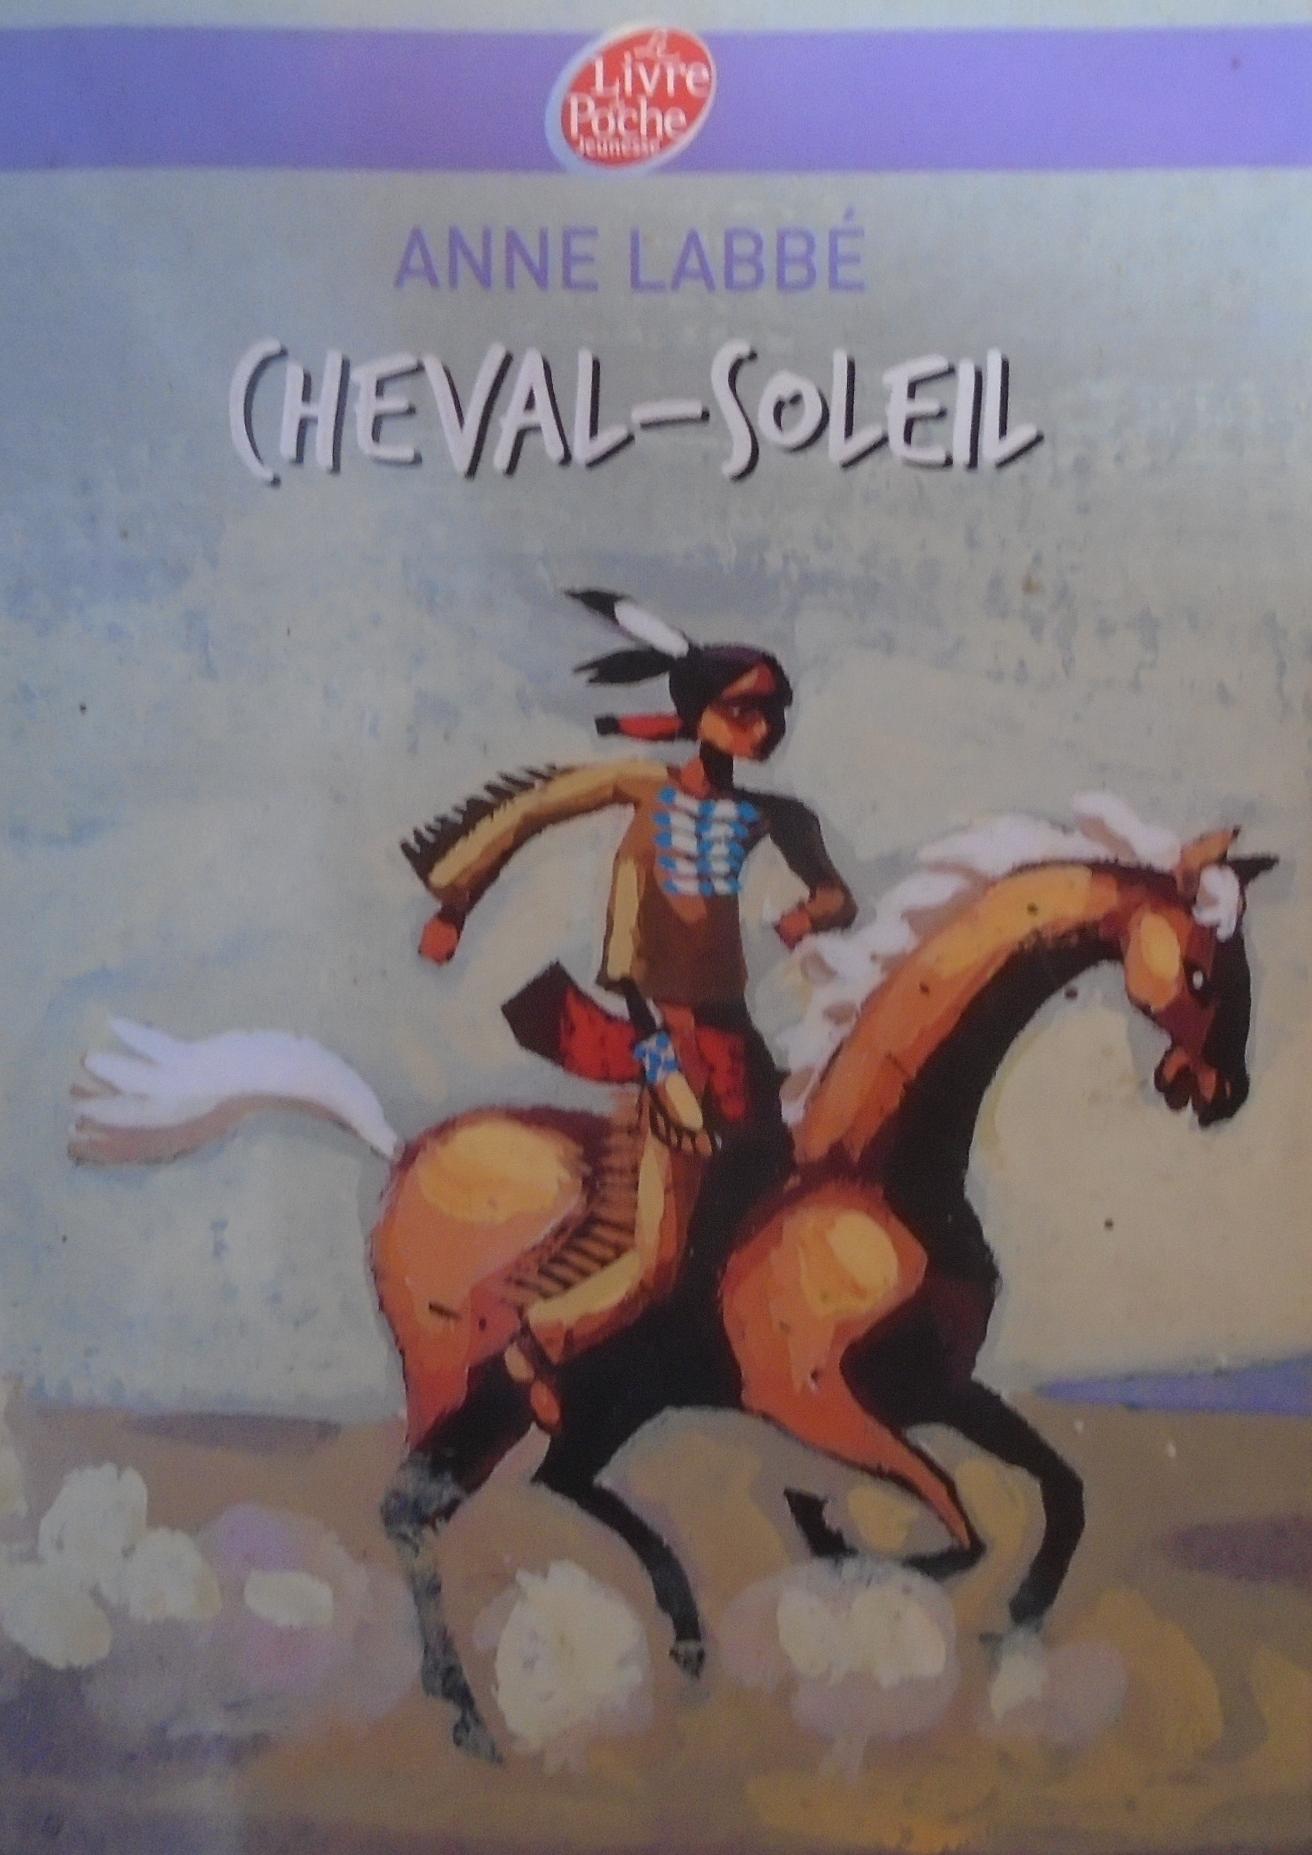 Cheval-Soleil